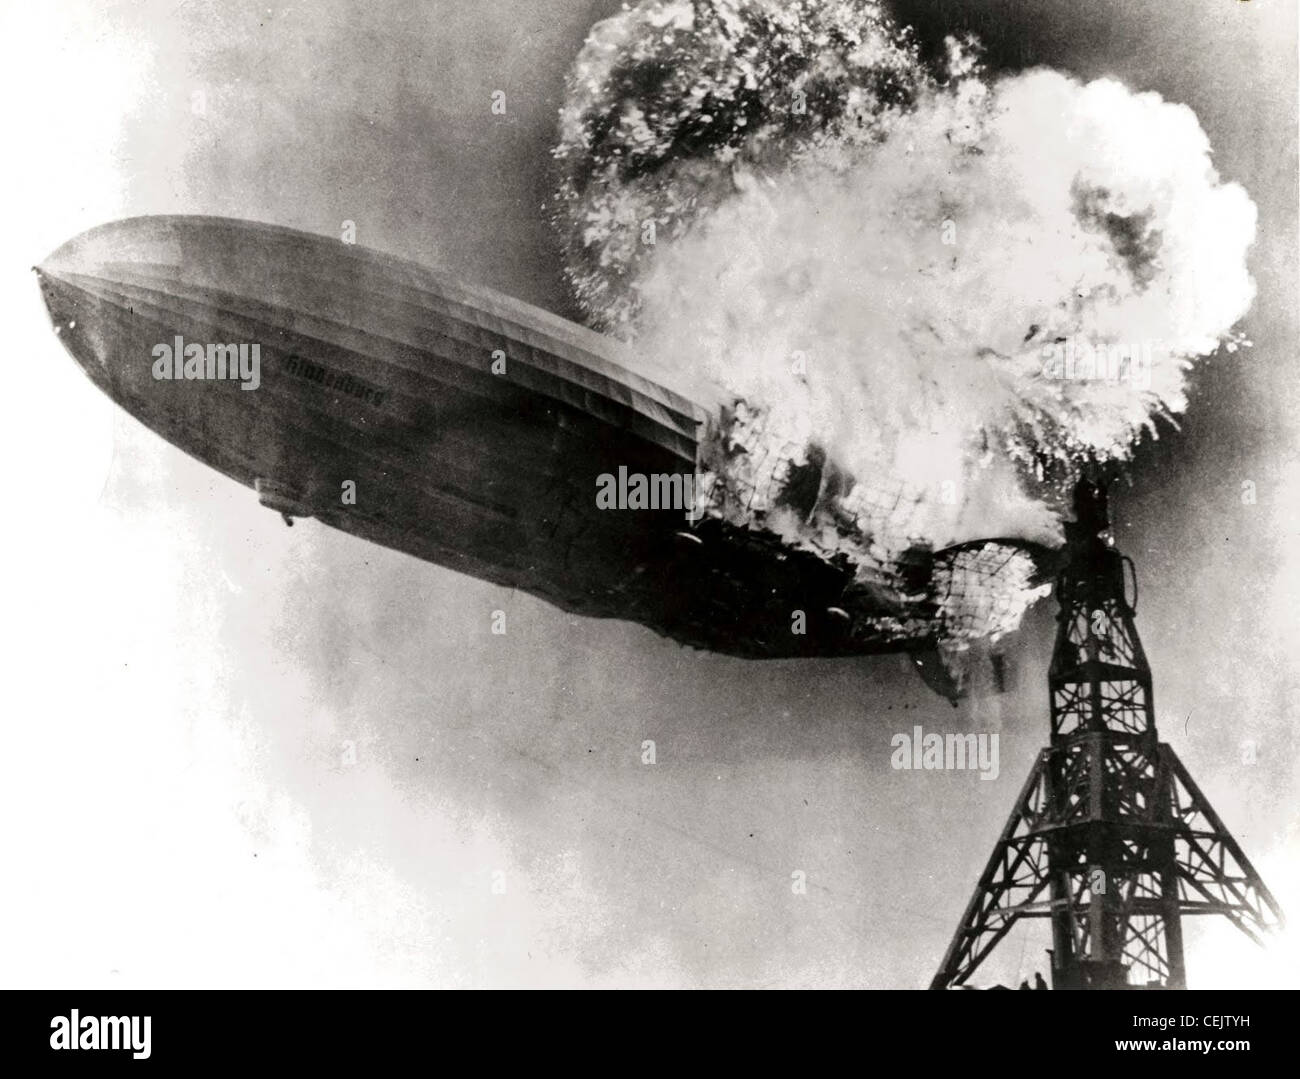 La catastrophe du Hindenburg Photo Stock